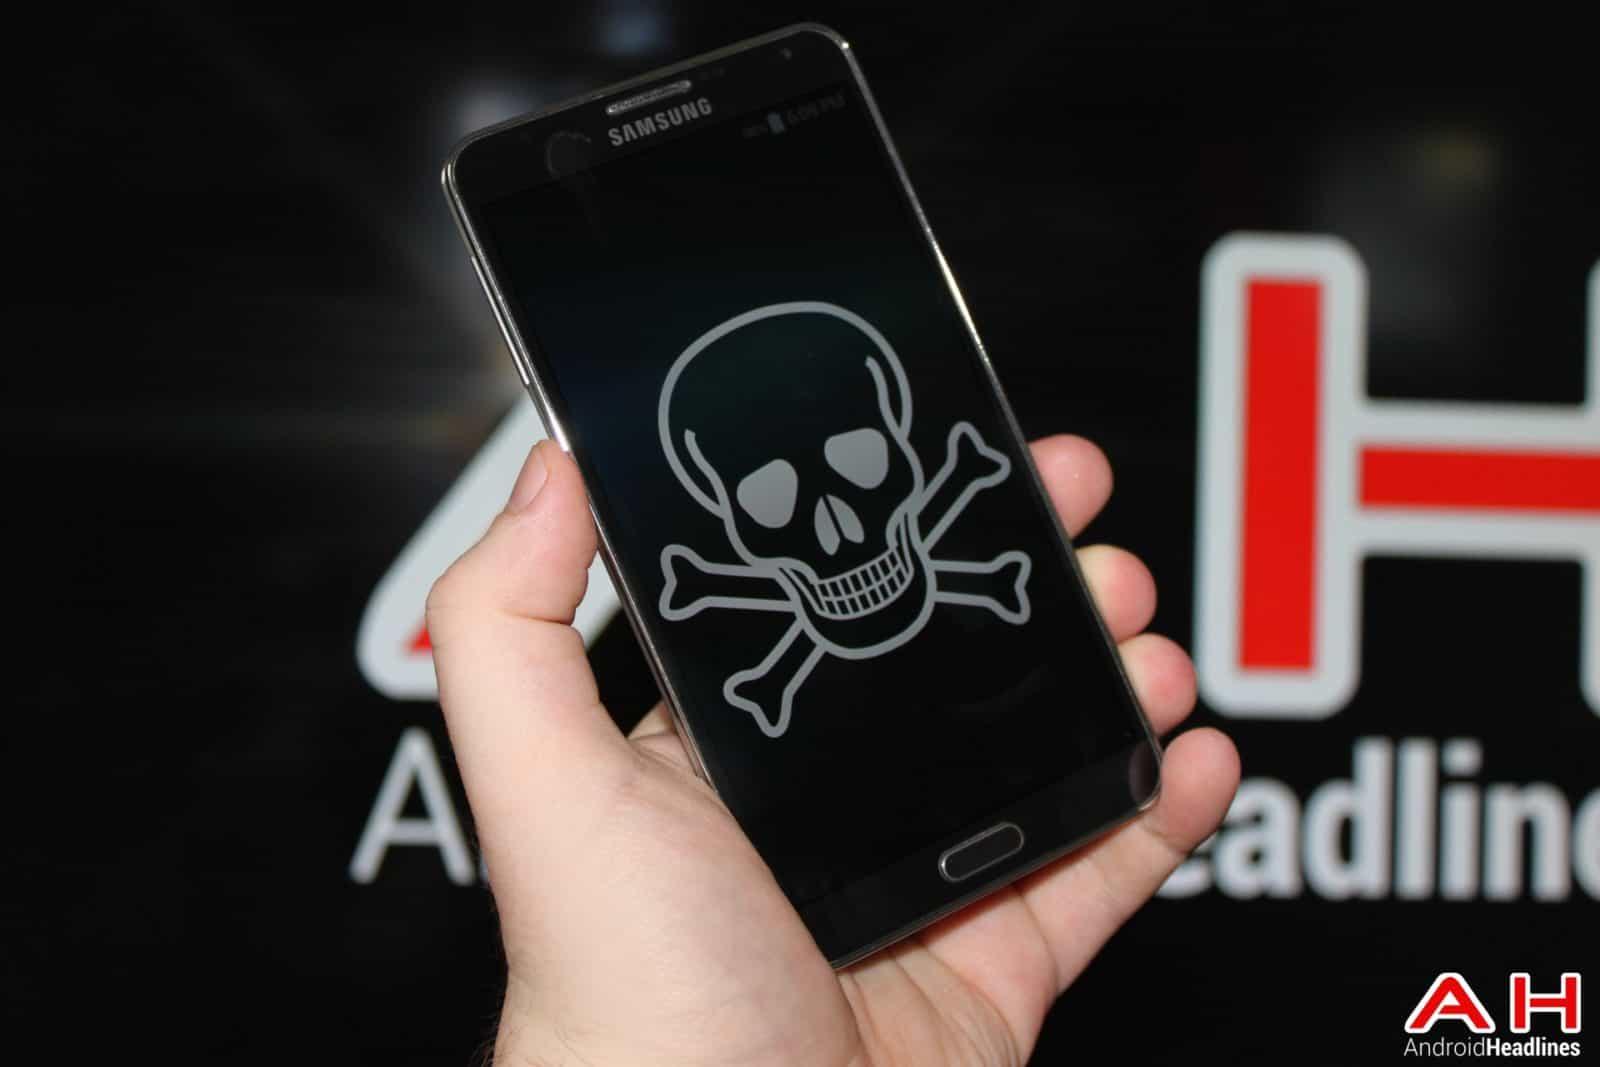 AH Virus Malware Piracy Skull Death Samsung logo 1.0